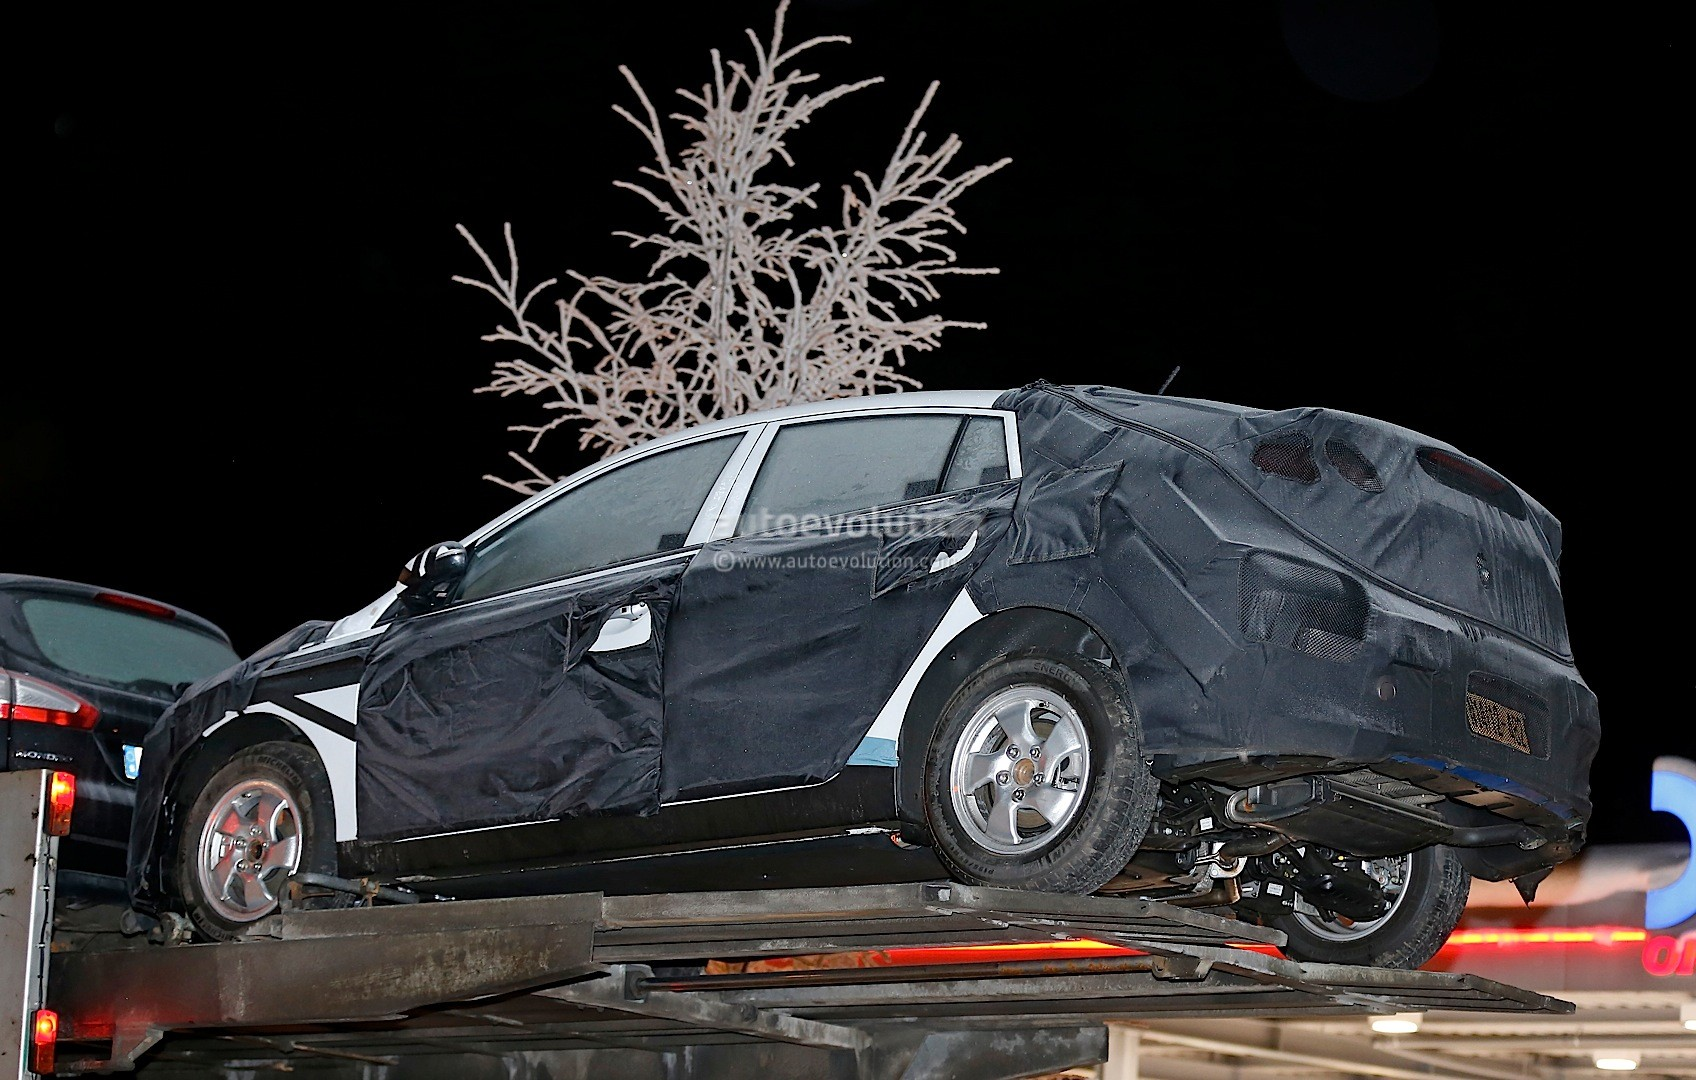 2016 - [Hyundai] Ioniq Hybrid-hyundai-elantra-like-prototype-spied-to-start-production-in-2016-photo-gallery_6